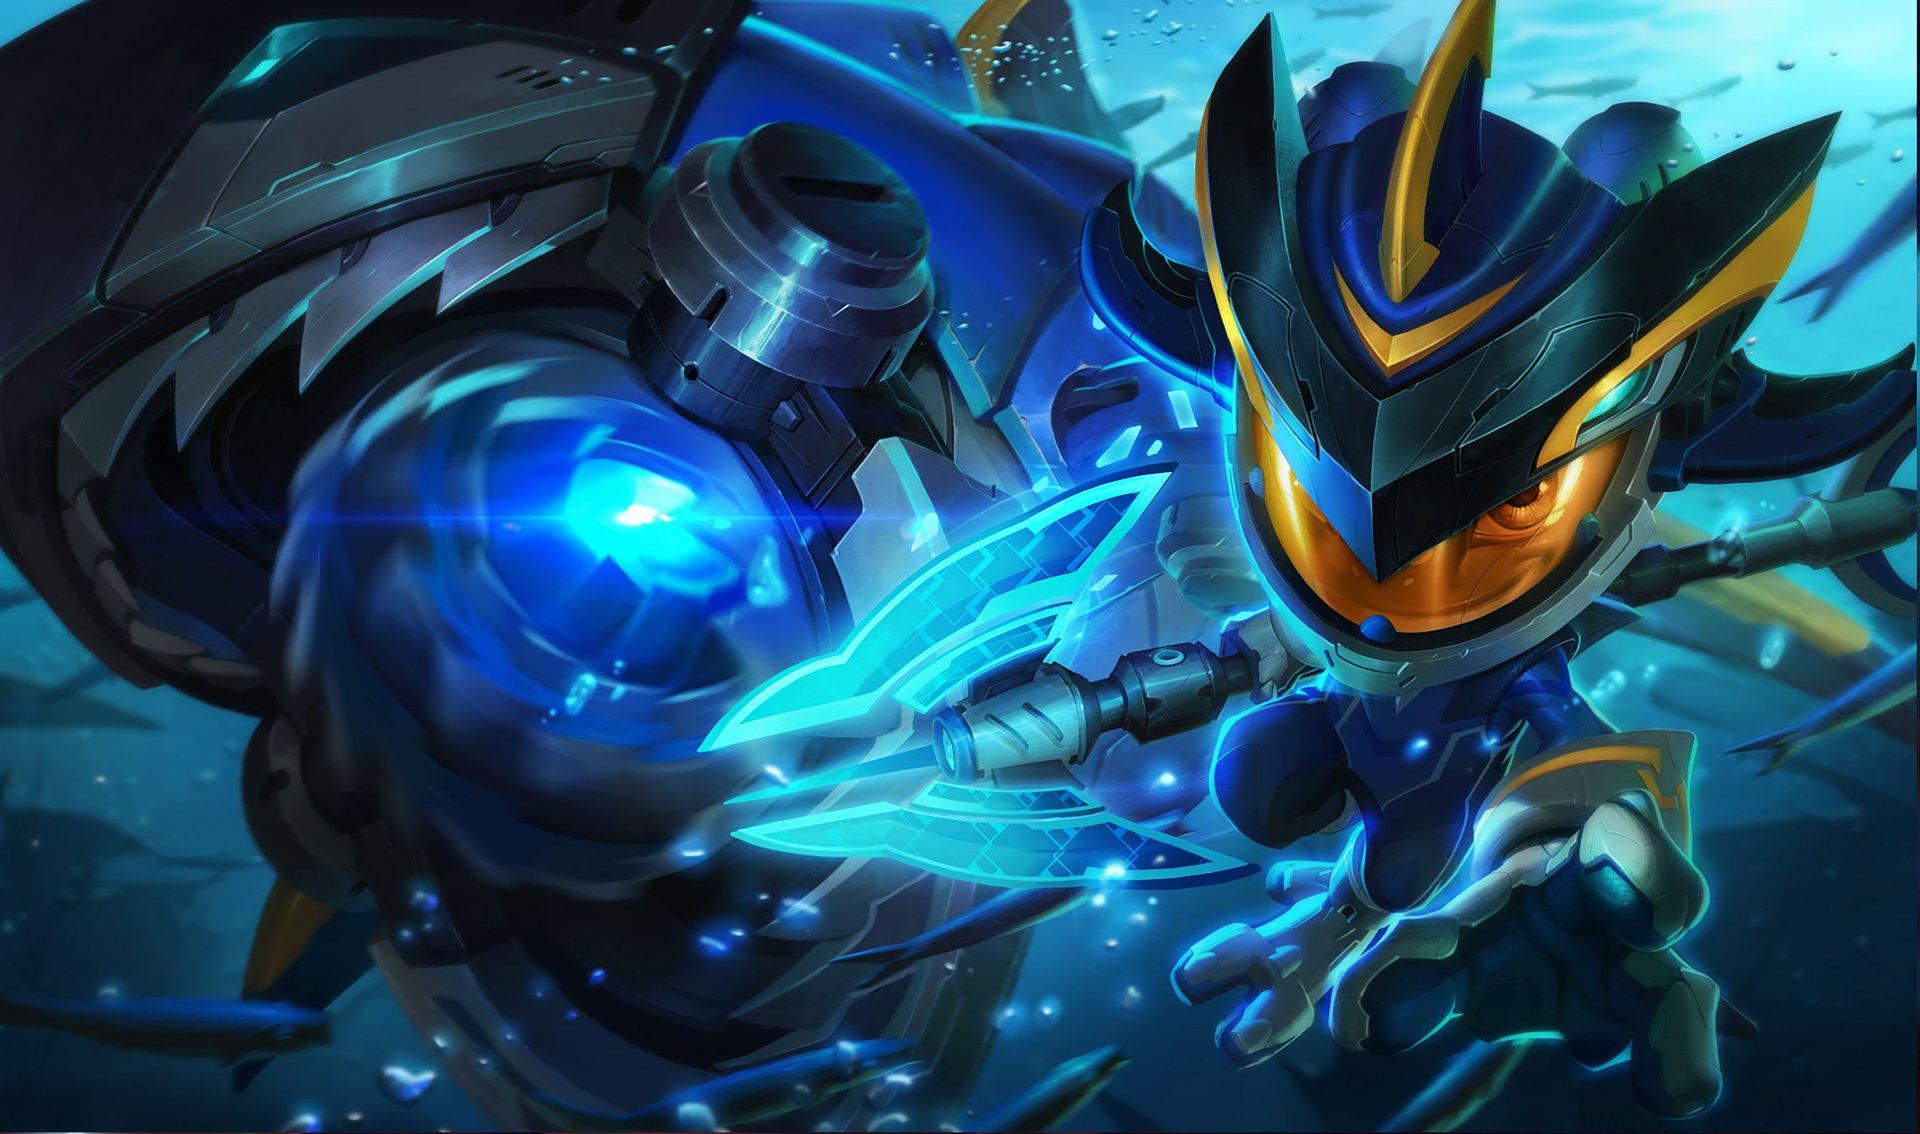 Fondos Para Pantalla: League Of Legends Fondo De Pantalla HD